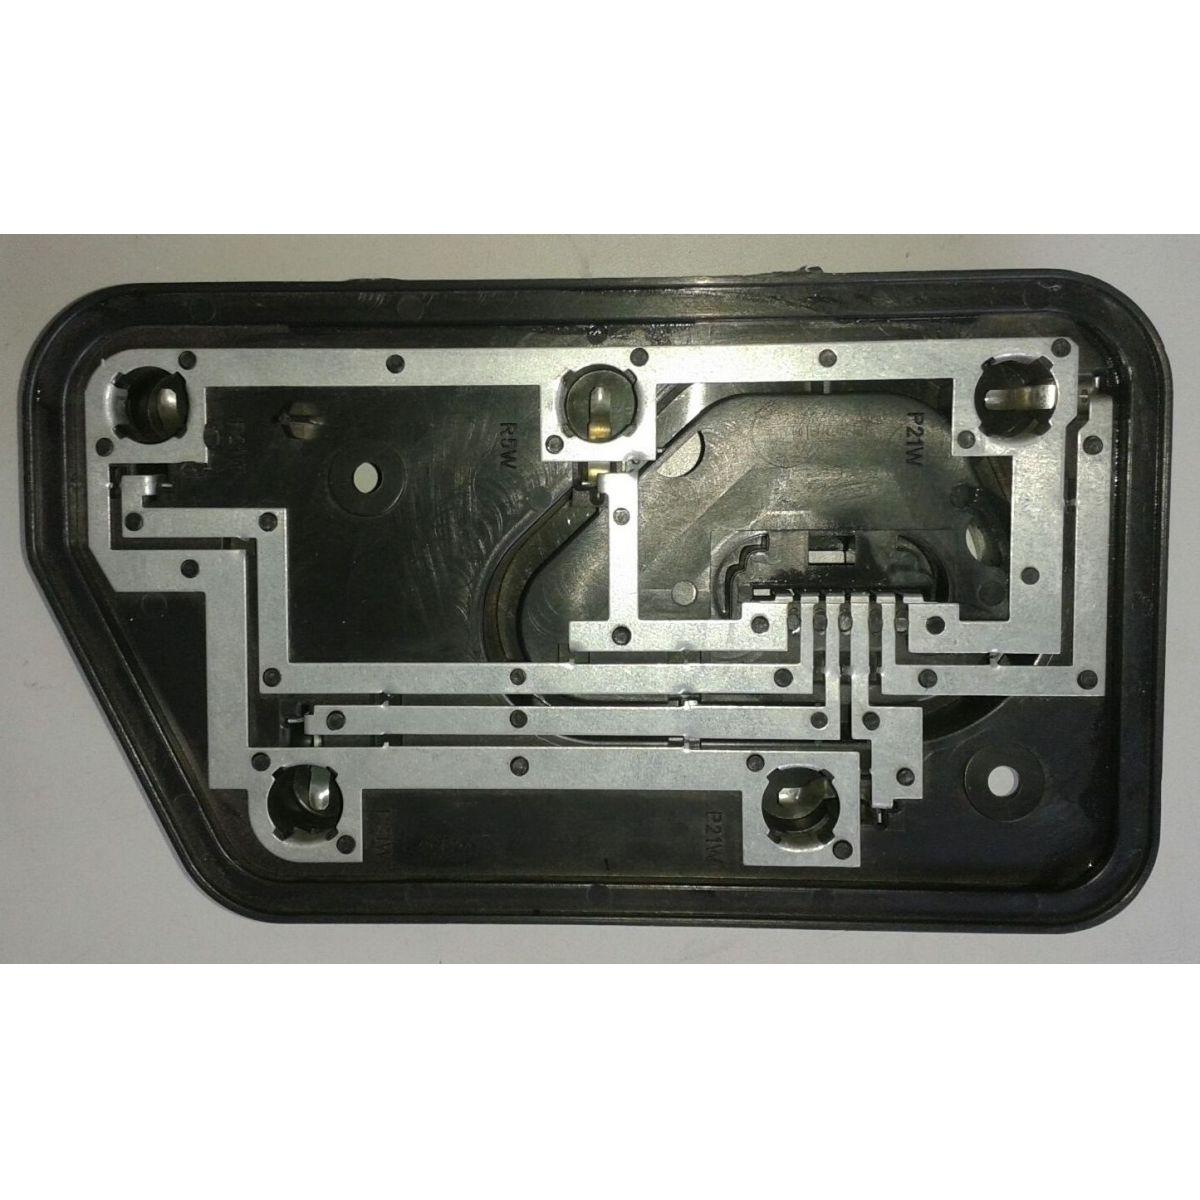 Soquete Circuito Lanterna Traseira Tipo Direito ou Esquerdo   - Amd Auto Peças